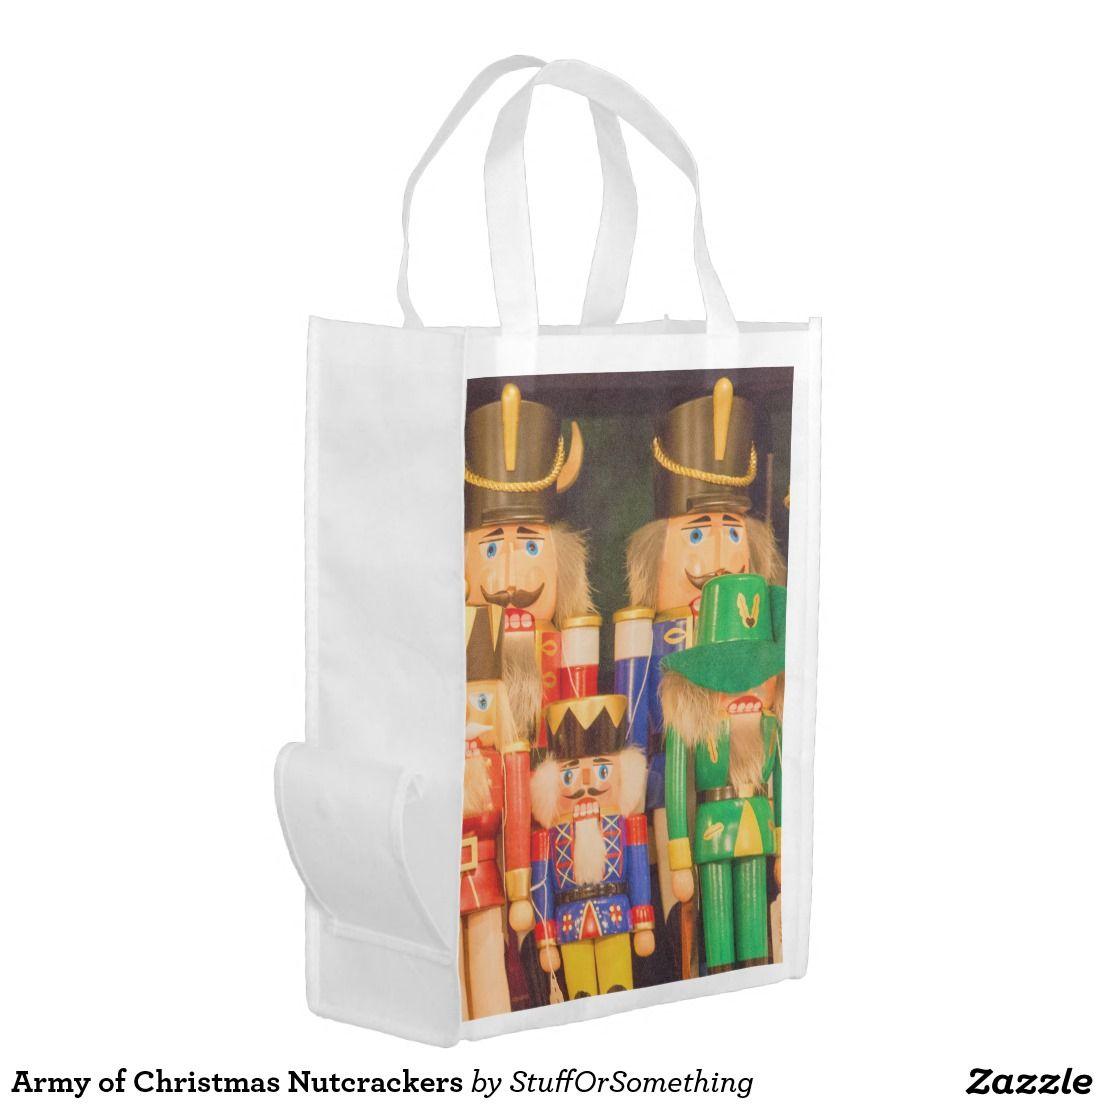 Army of Christmas Nutcrackers Grocery Bag